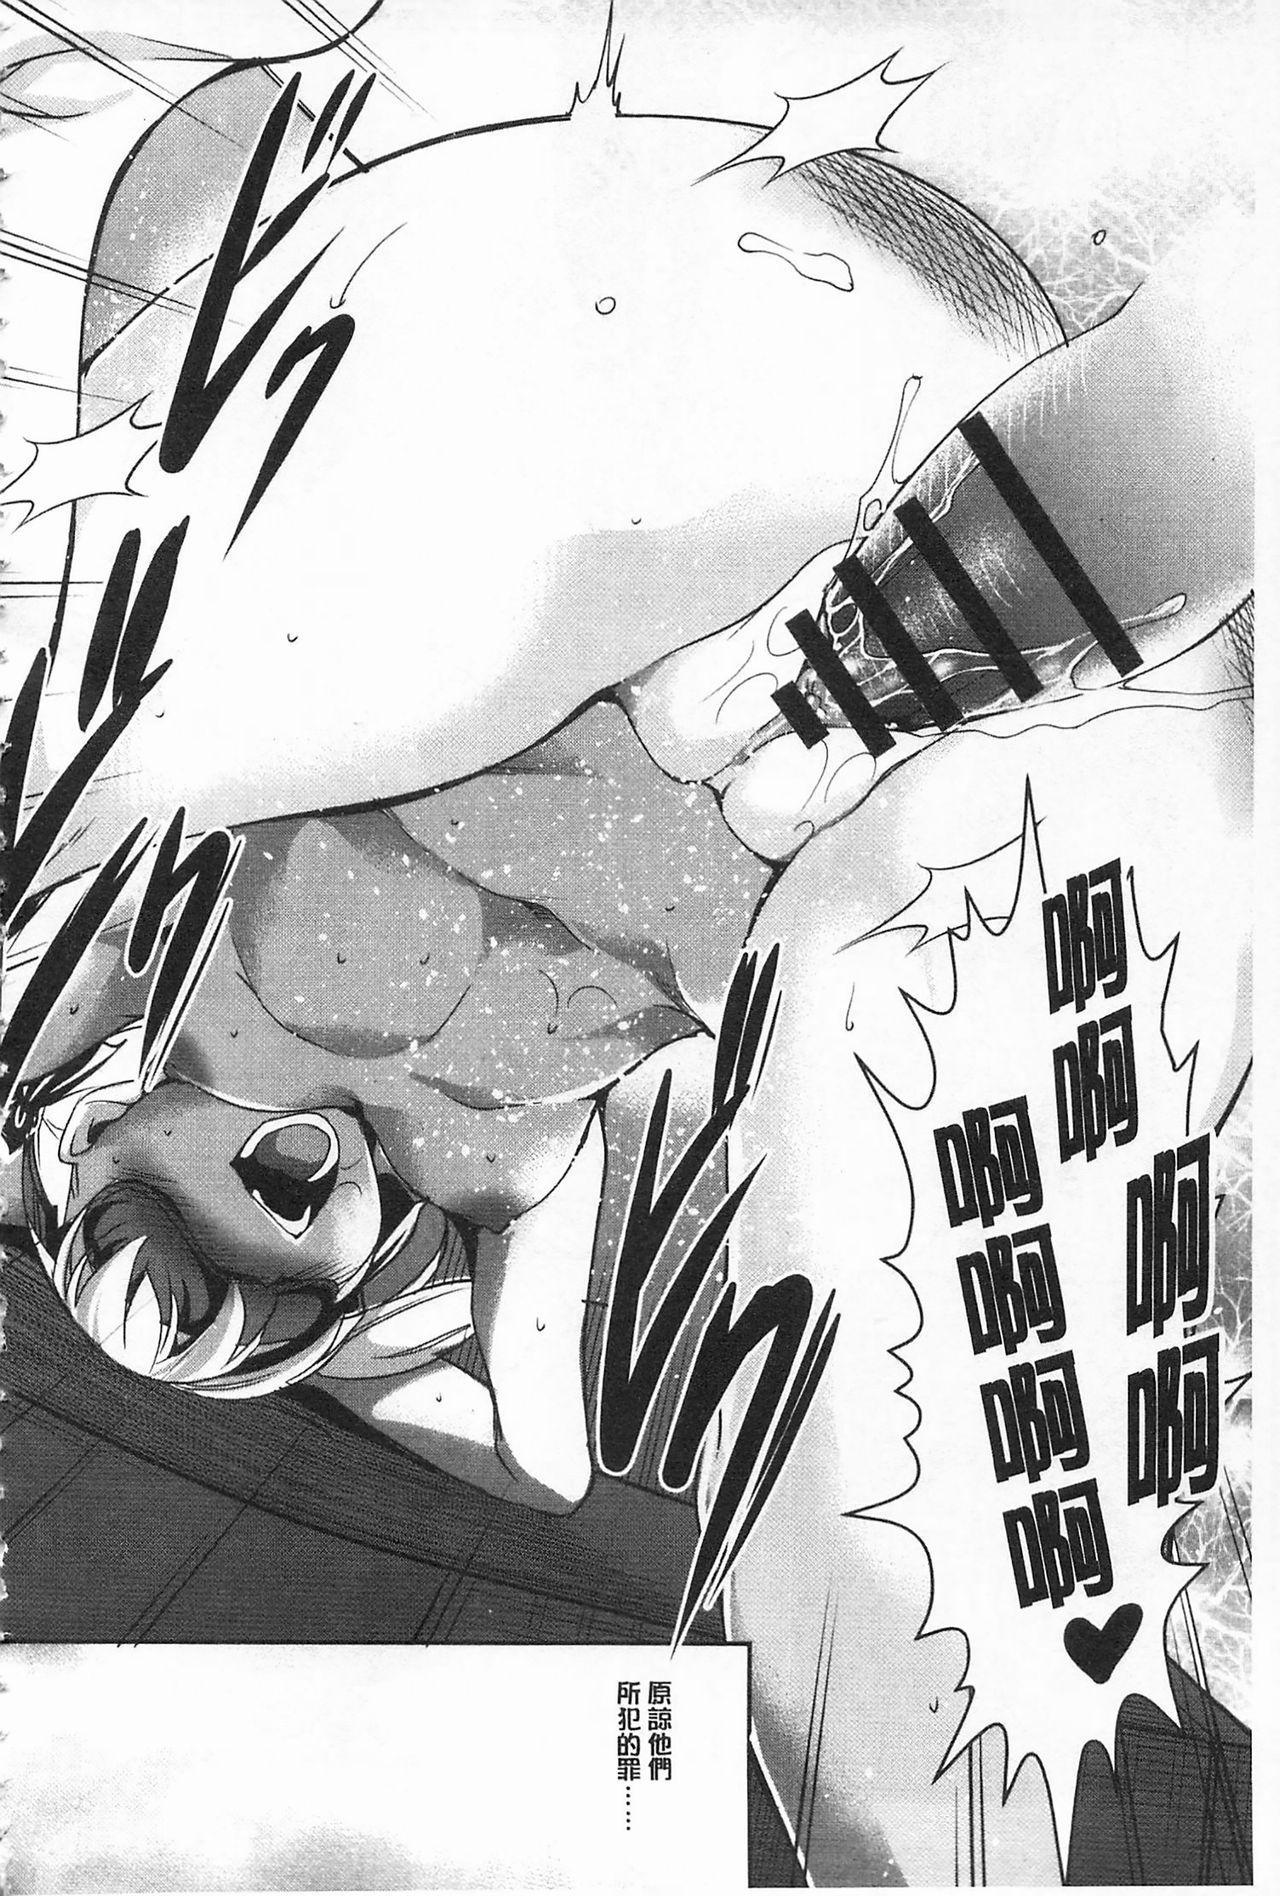 [Amano Kazumi] Seida Inyou -Seijo no Katachi Shita Intou- | 聖墮陰陽 -聖女的容貌與淫蕩- [Chinese] 29